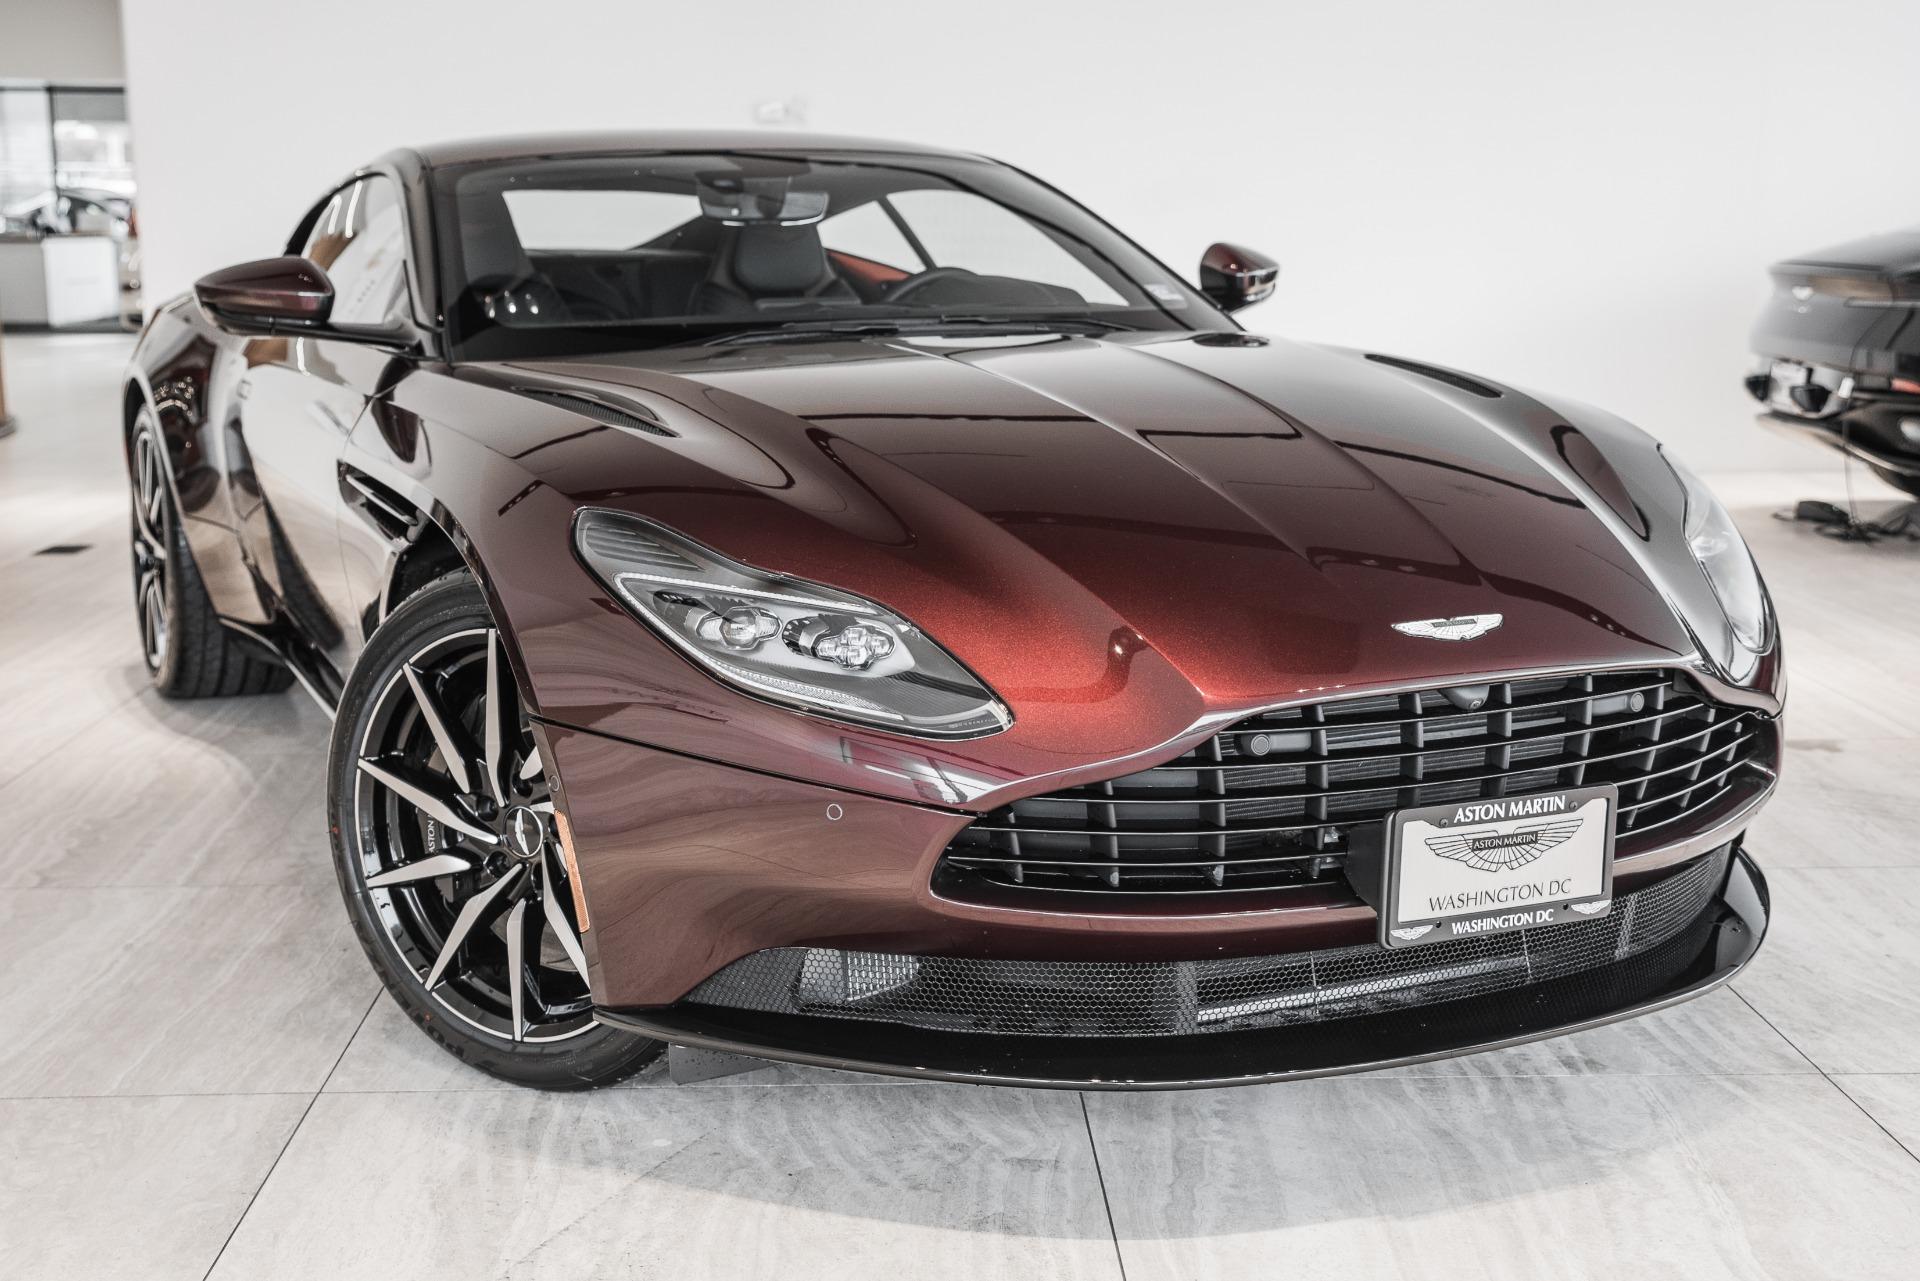 2020 Aston Martin Db11 V8 Stock 20nl09522 For Sale Near Vienna Va Va Aston Martin Dealer